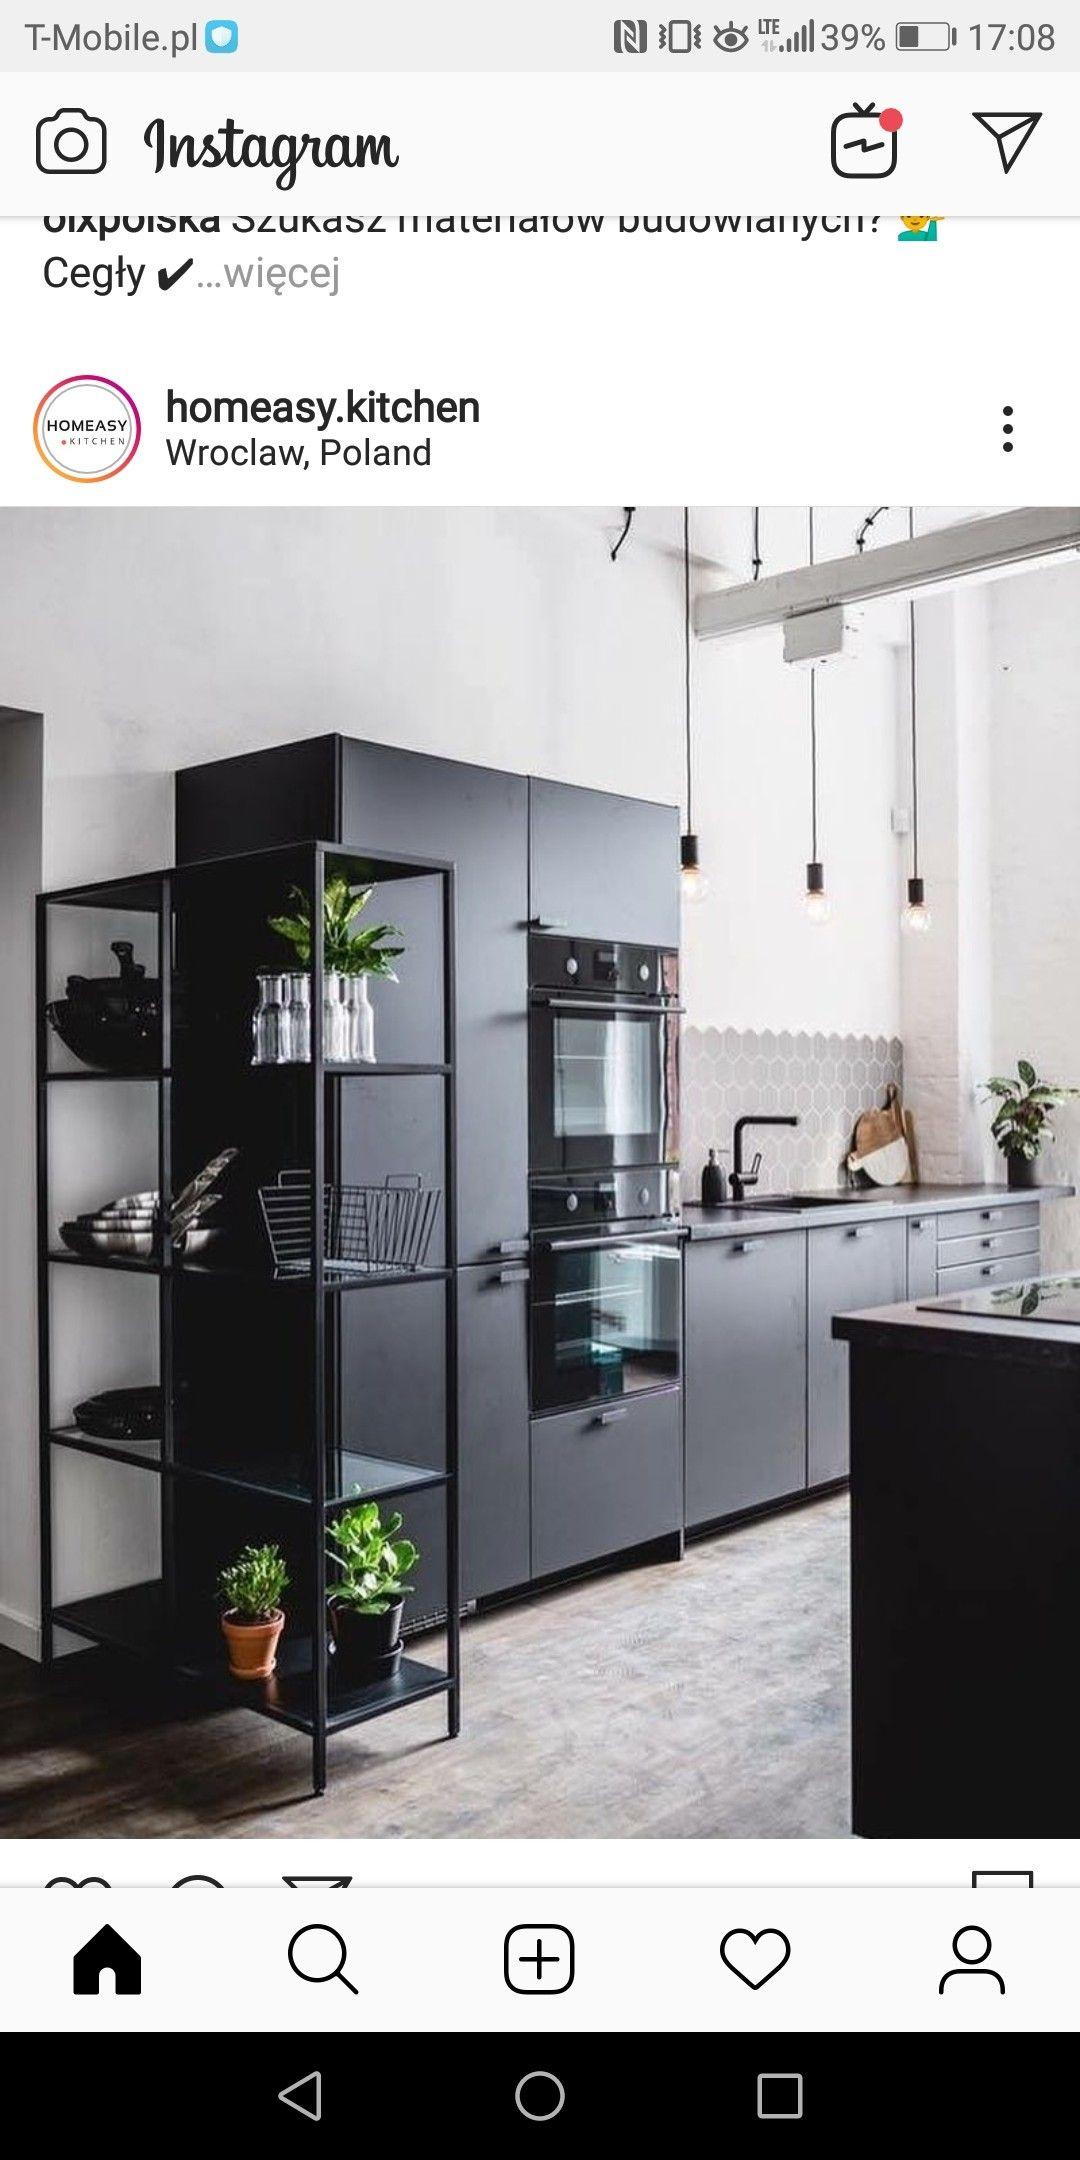 Pin by Katarzyna Olechowska on FINAL in 2019 Kitchen